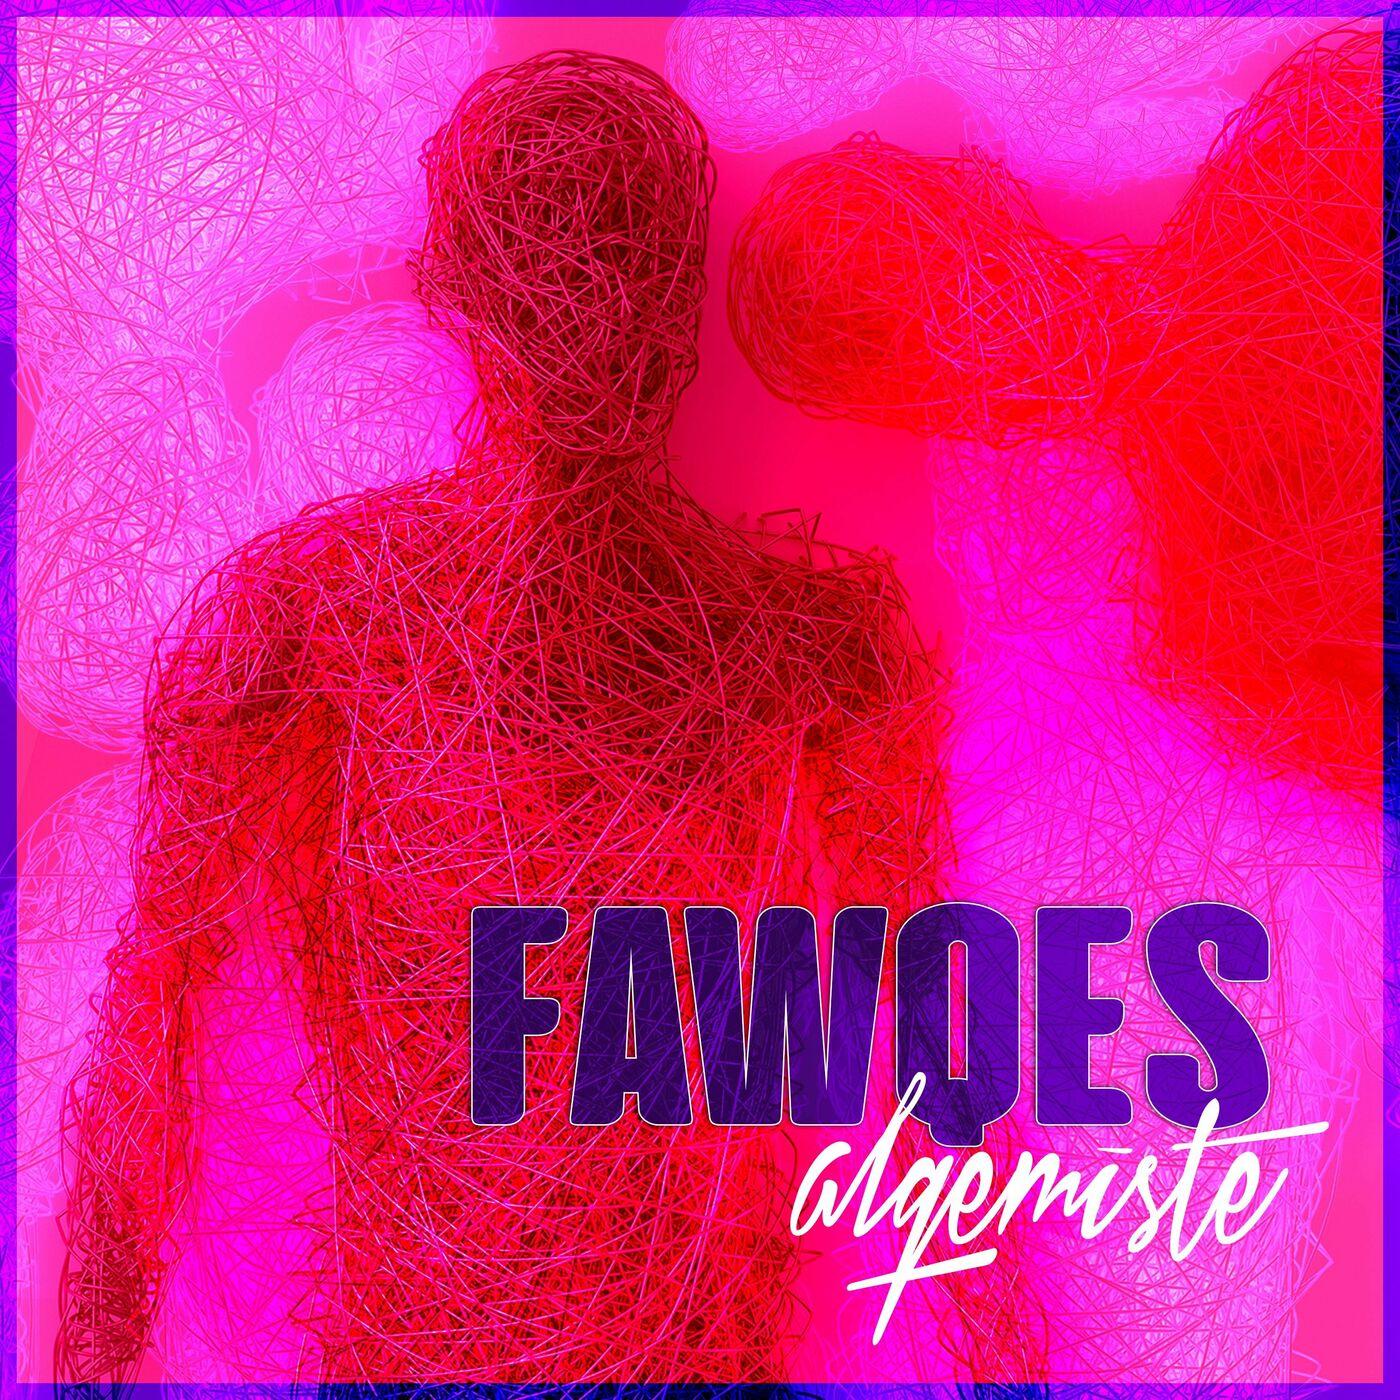 alqemiste - FAWQES [single] (2021)